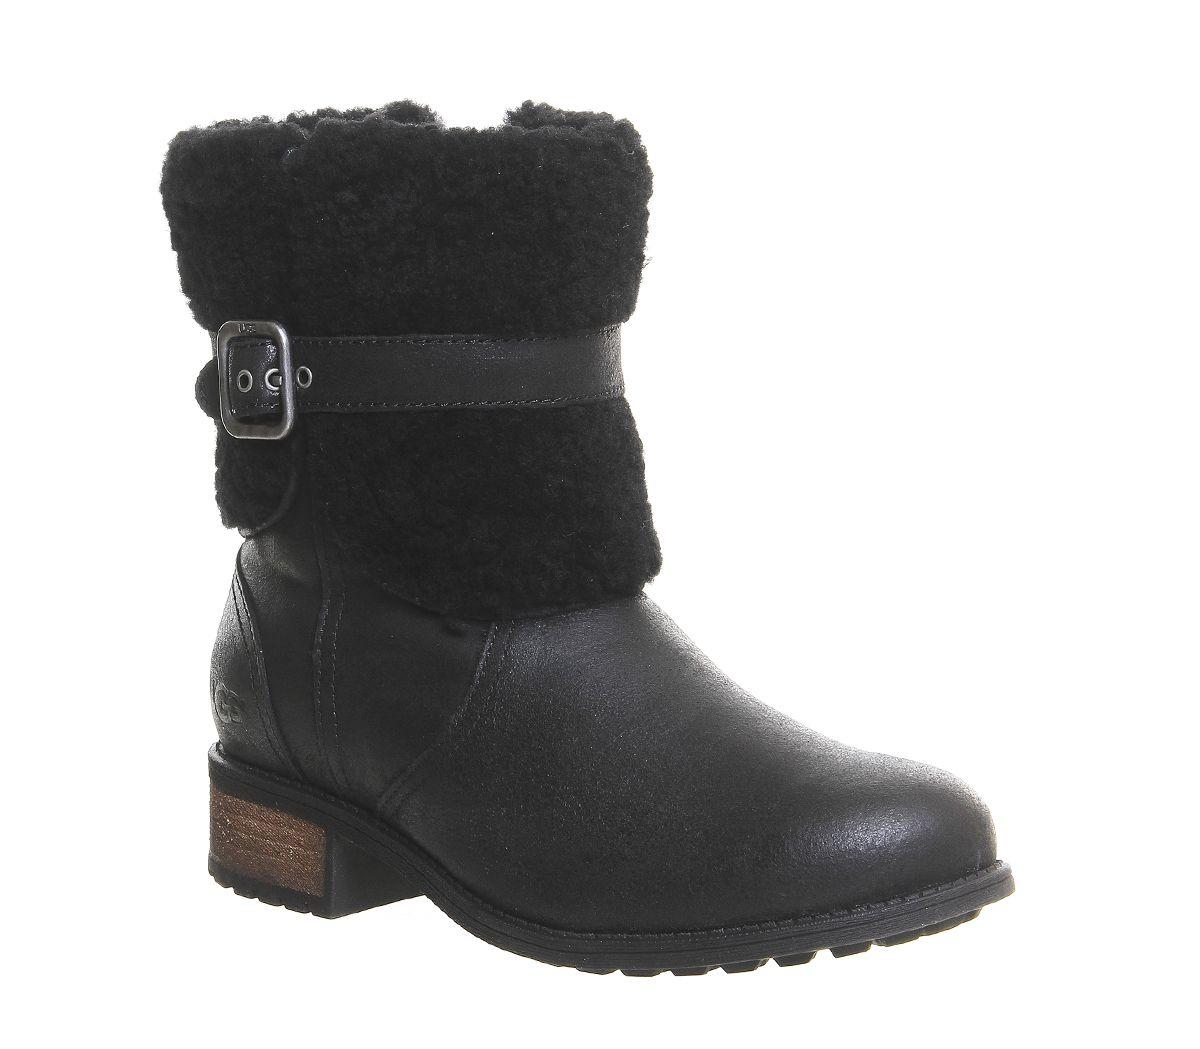 b558b26dc71 Blayre II Shearling Boots